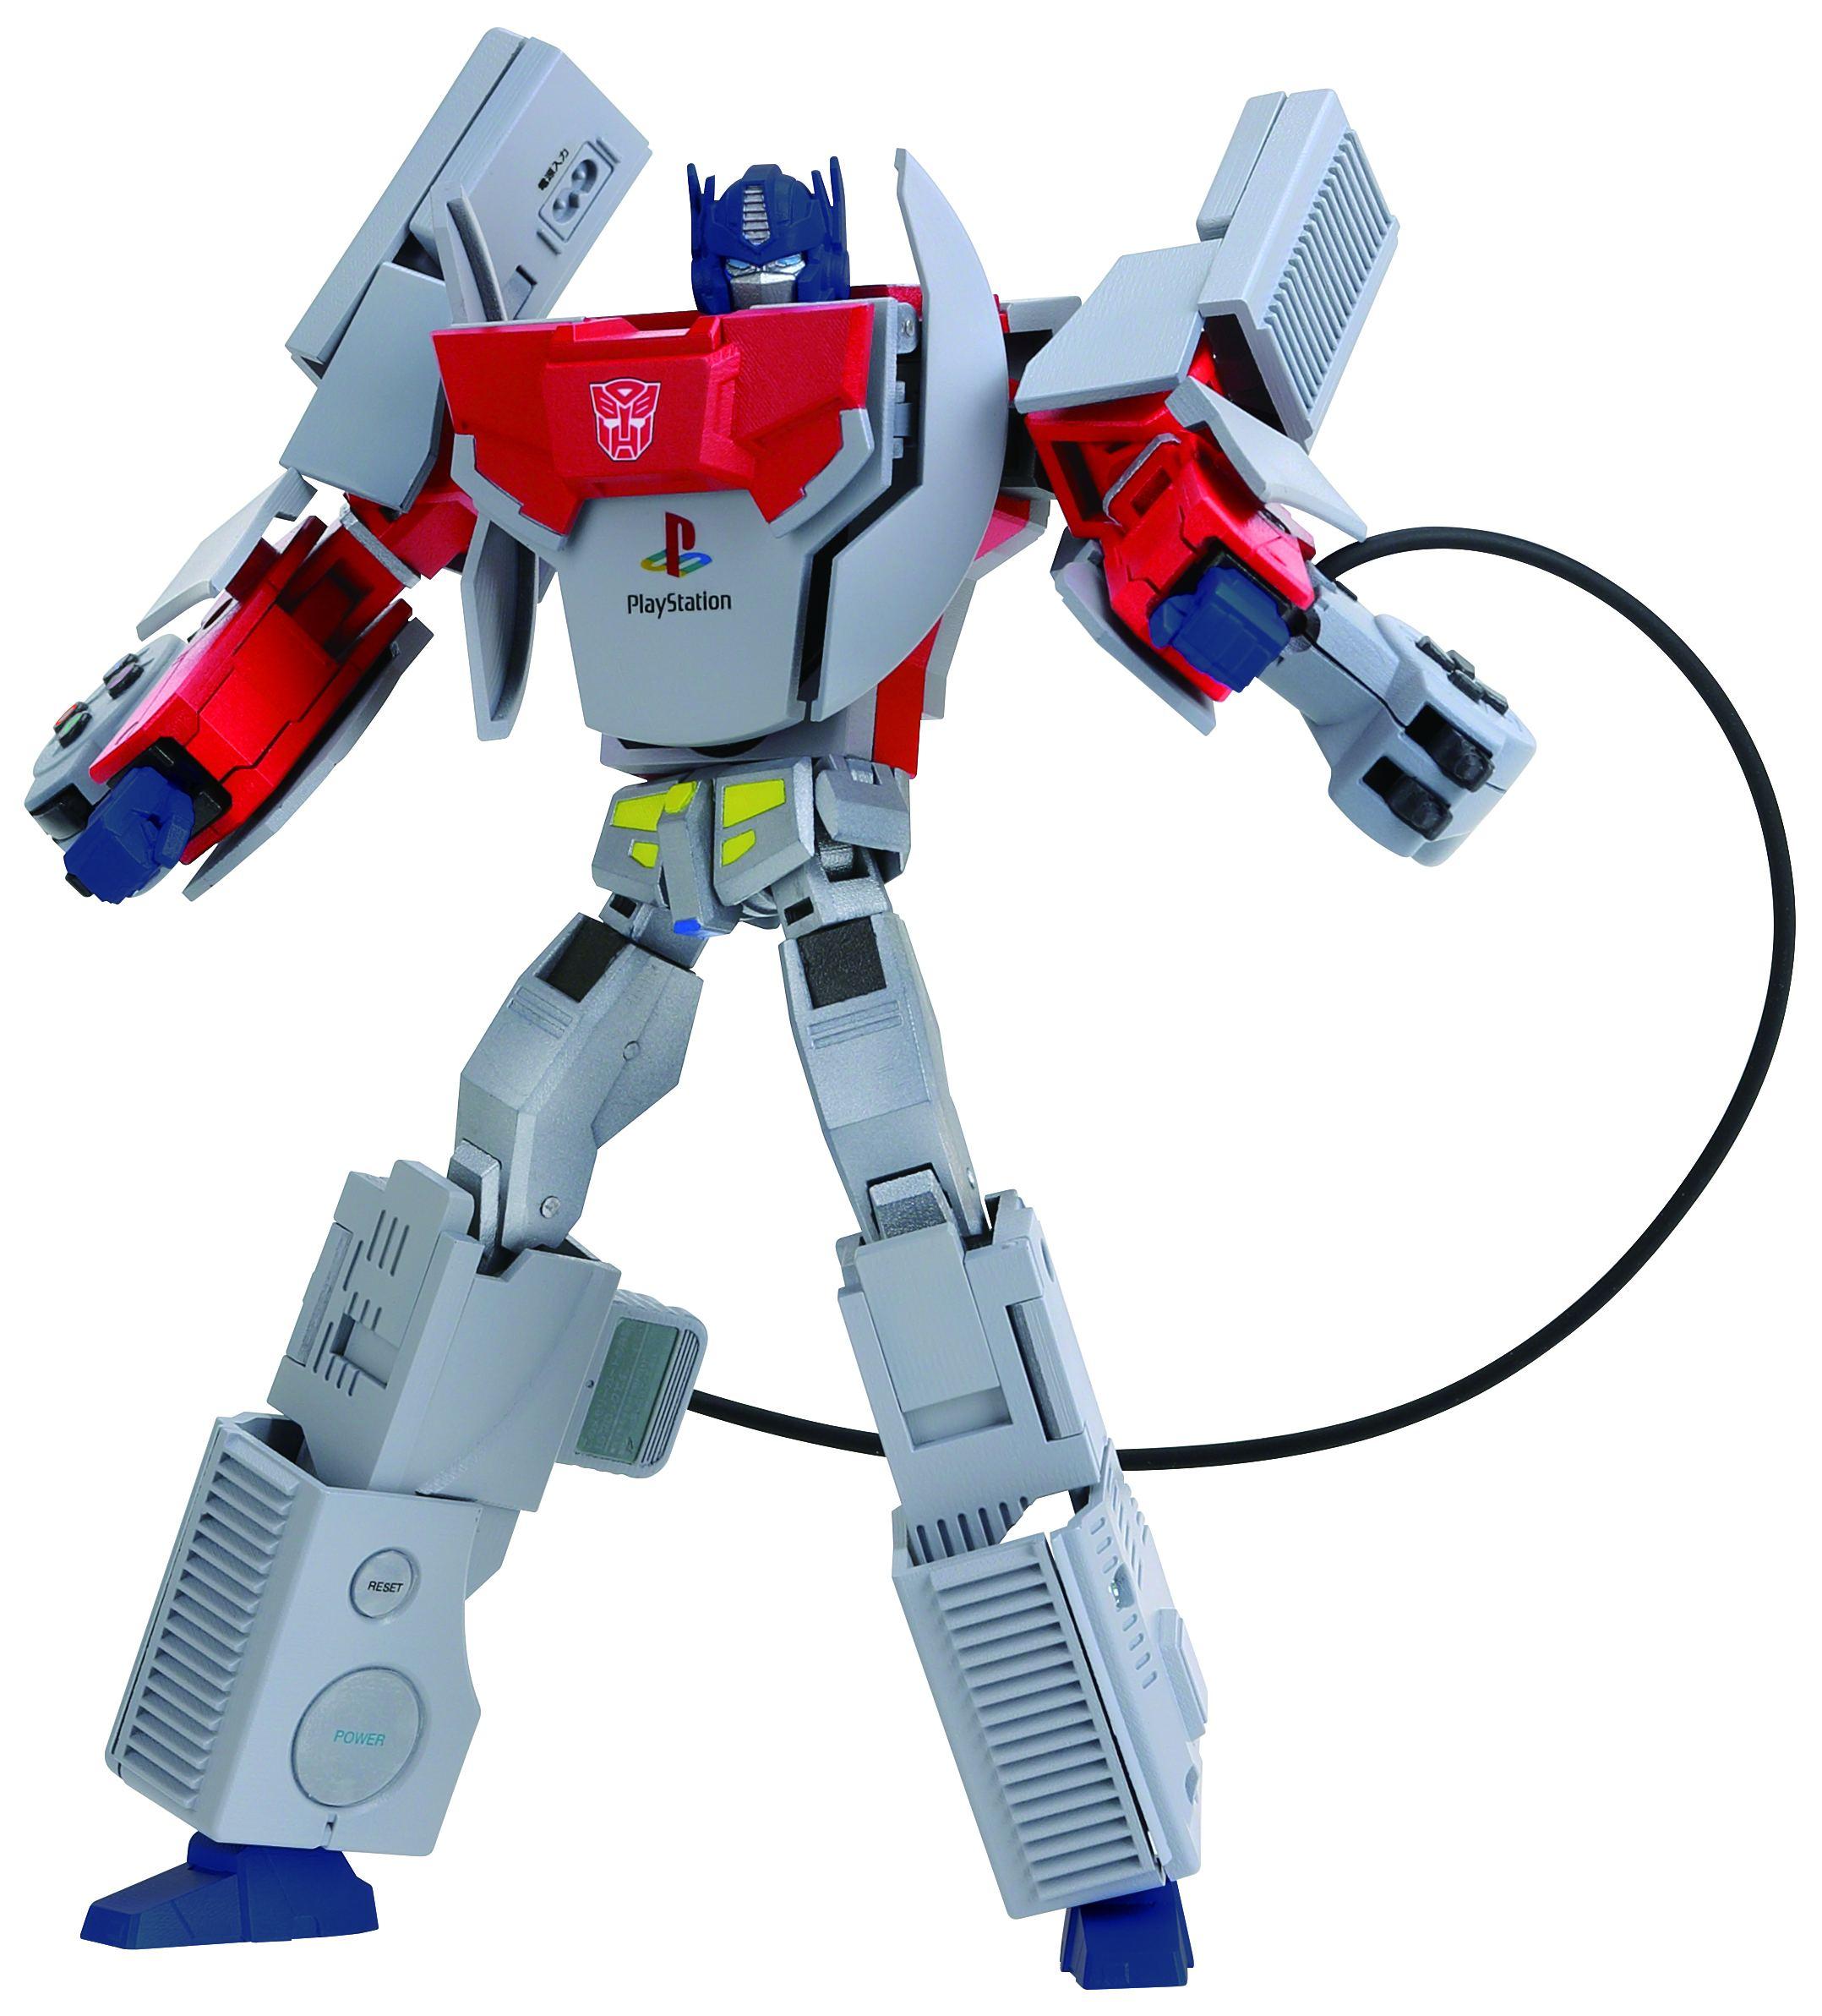 transformers: optimus prime featuring original playstation